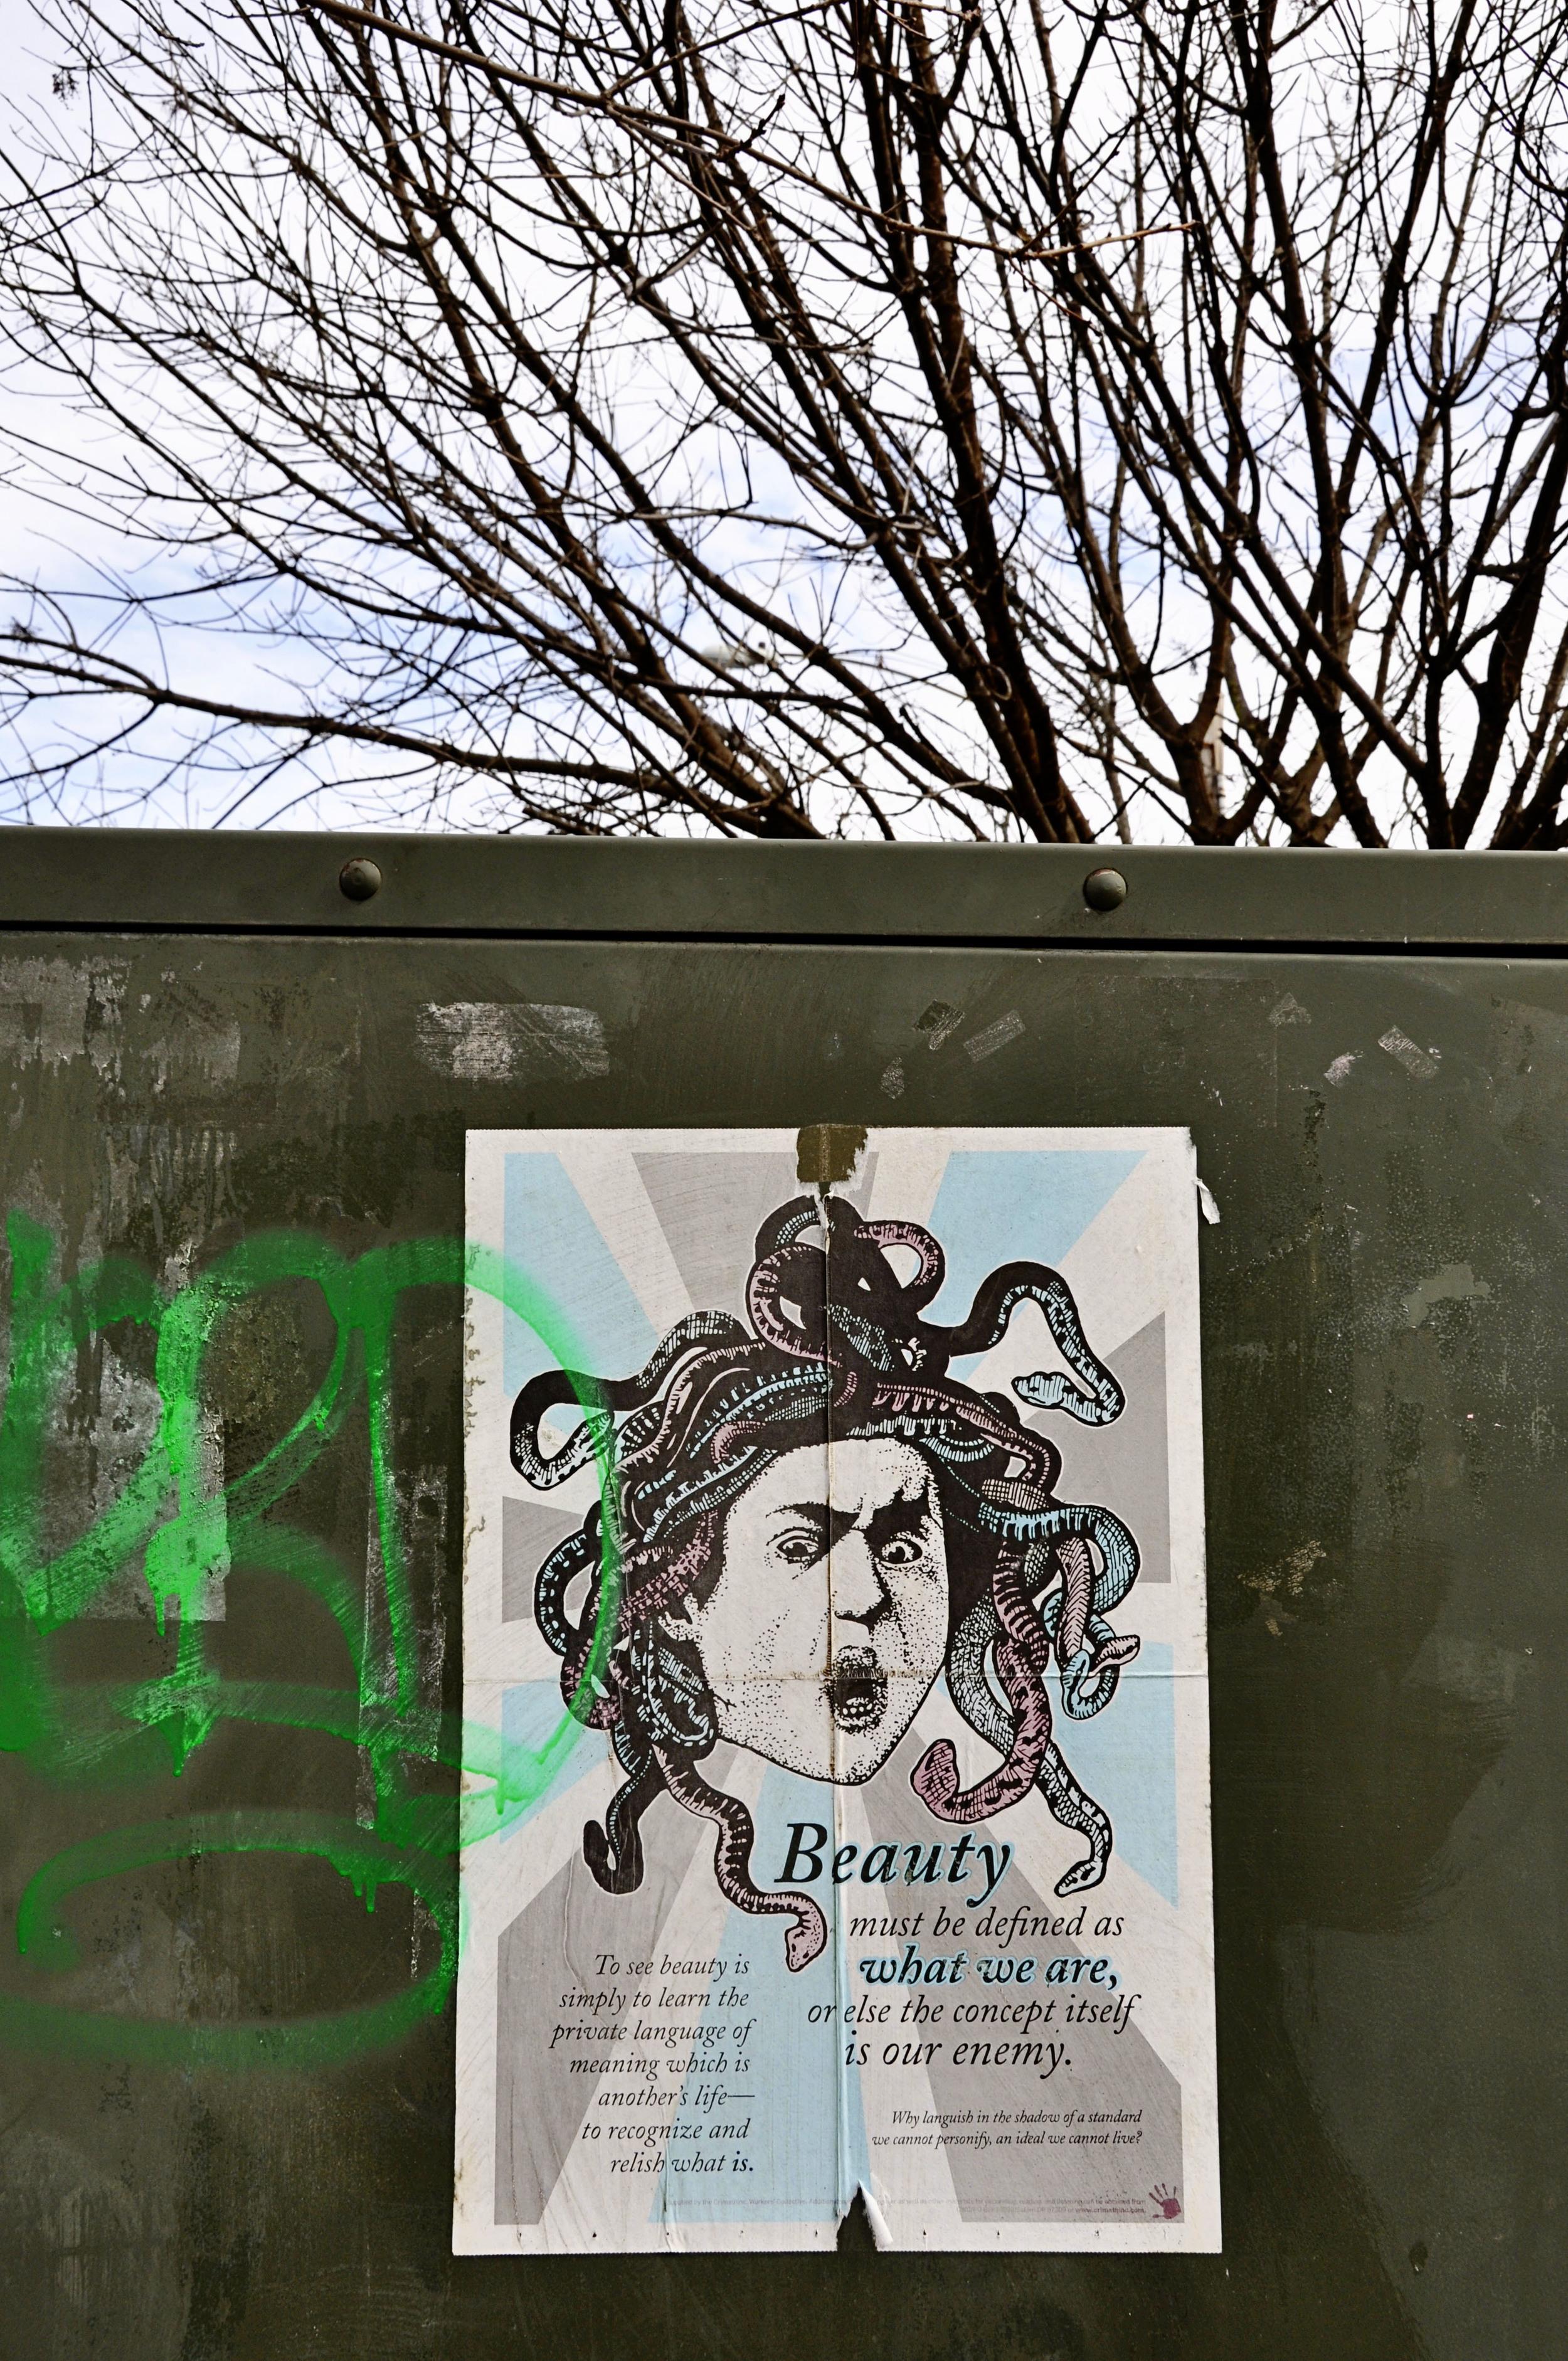 Subversive-Message-Beauty.jpg